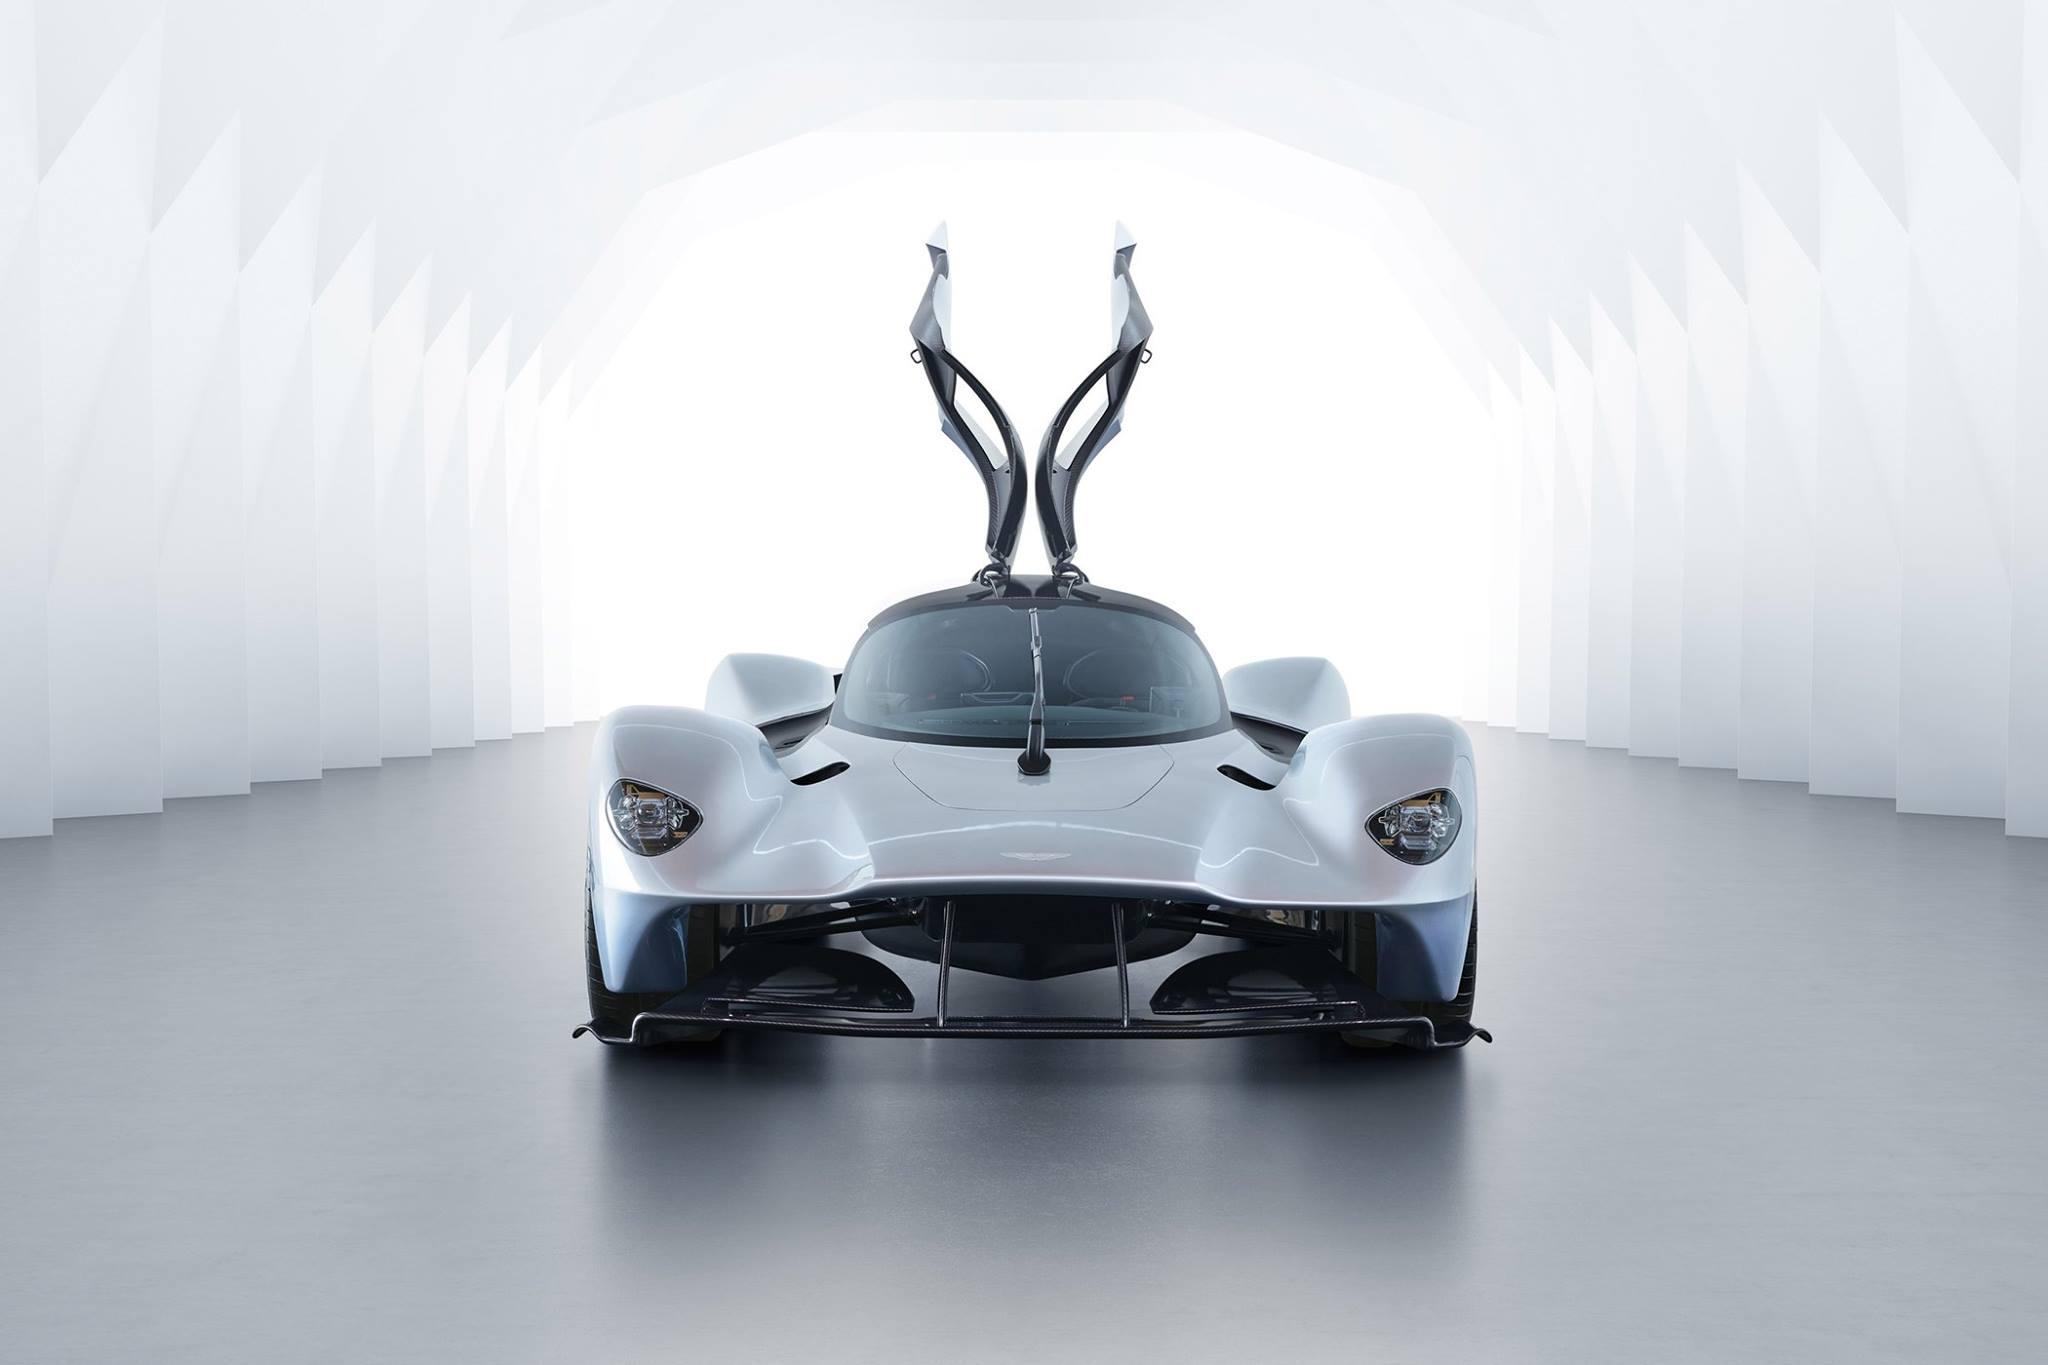 Aston-Martin-Valkyrie-Production-Version-6